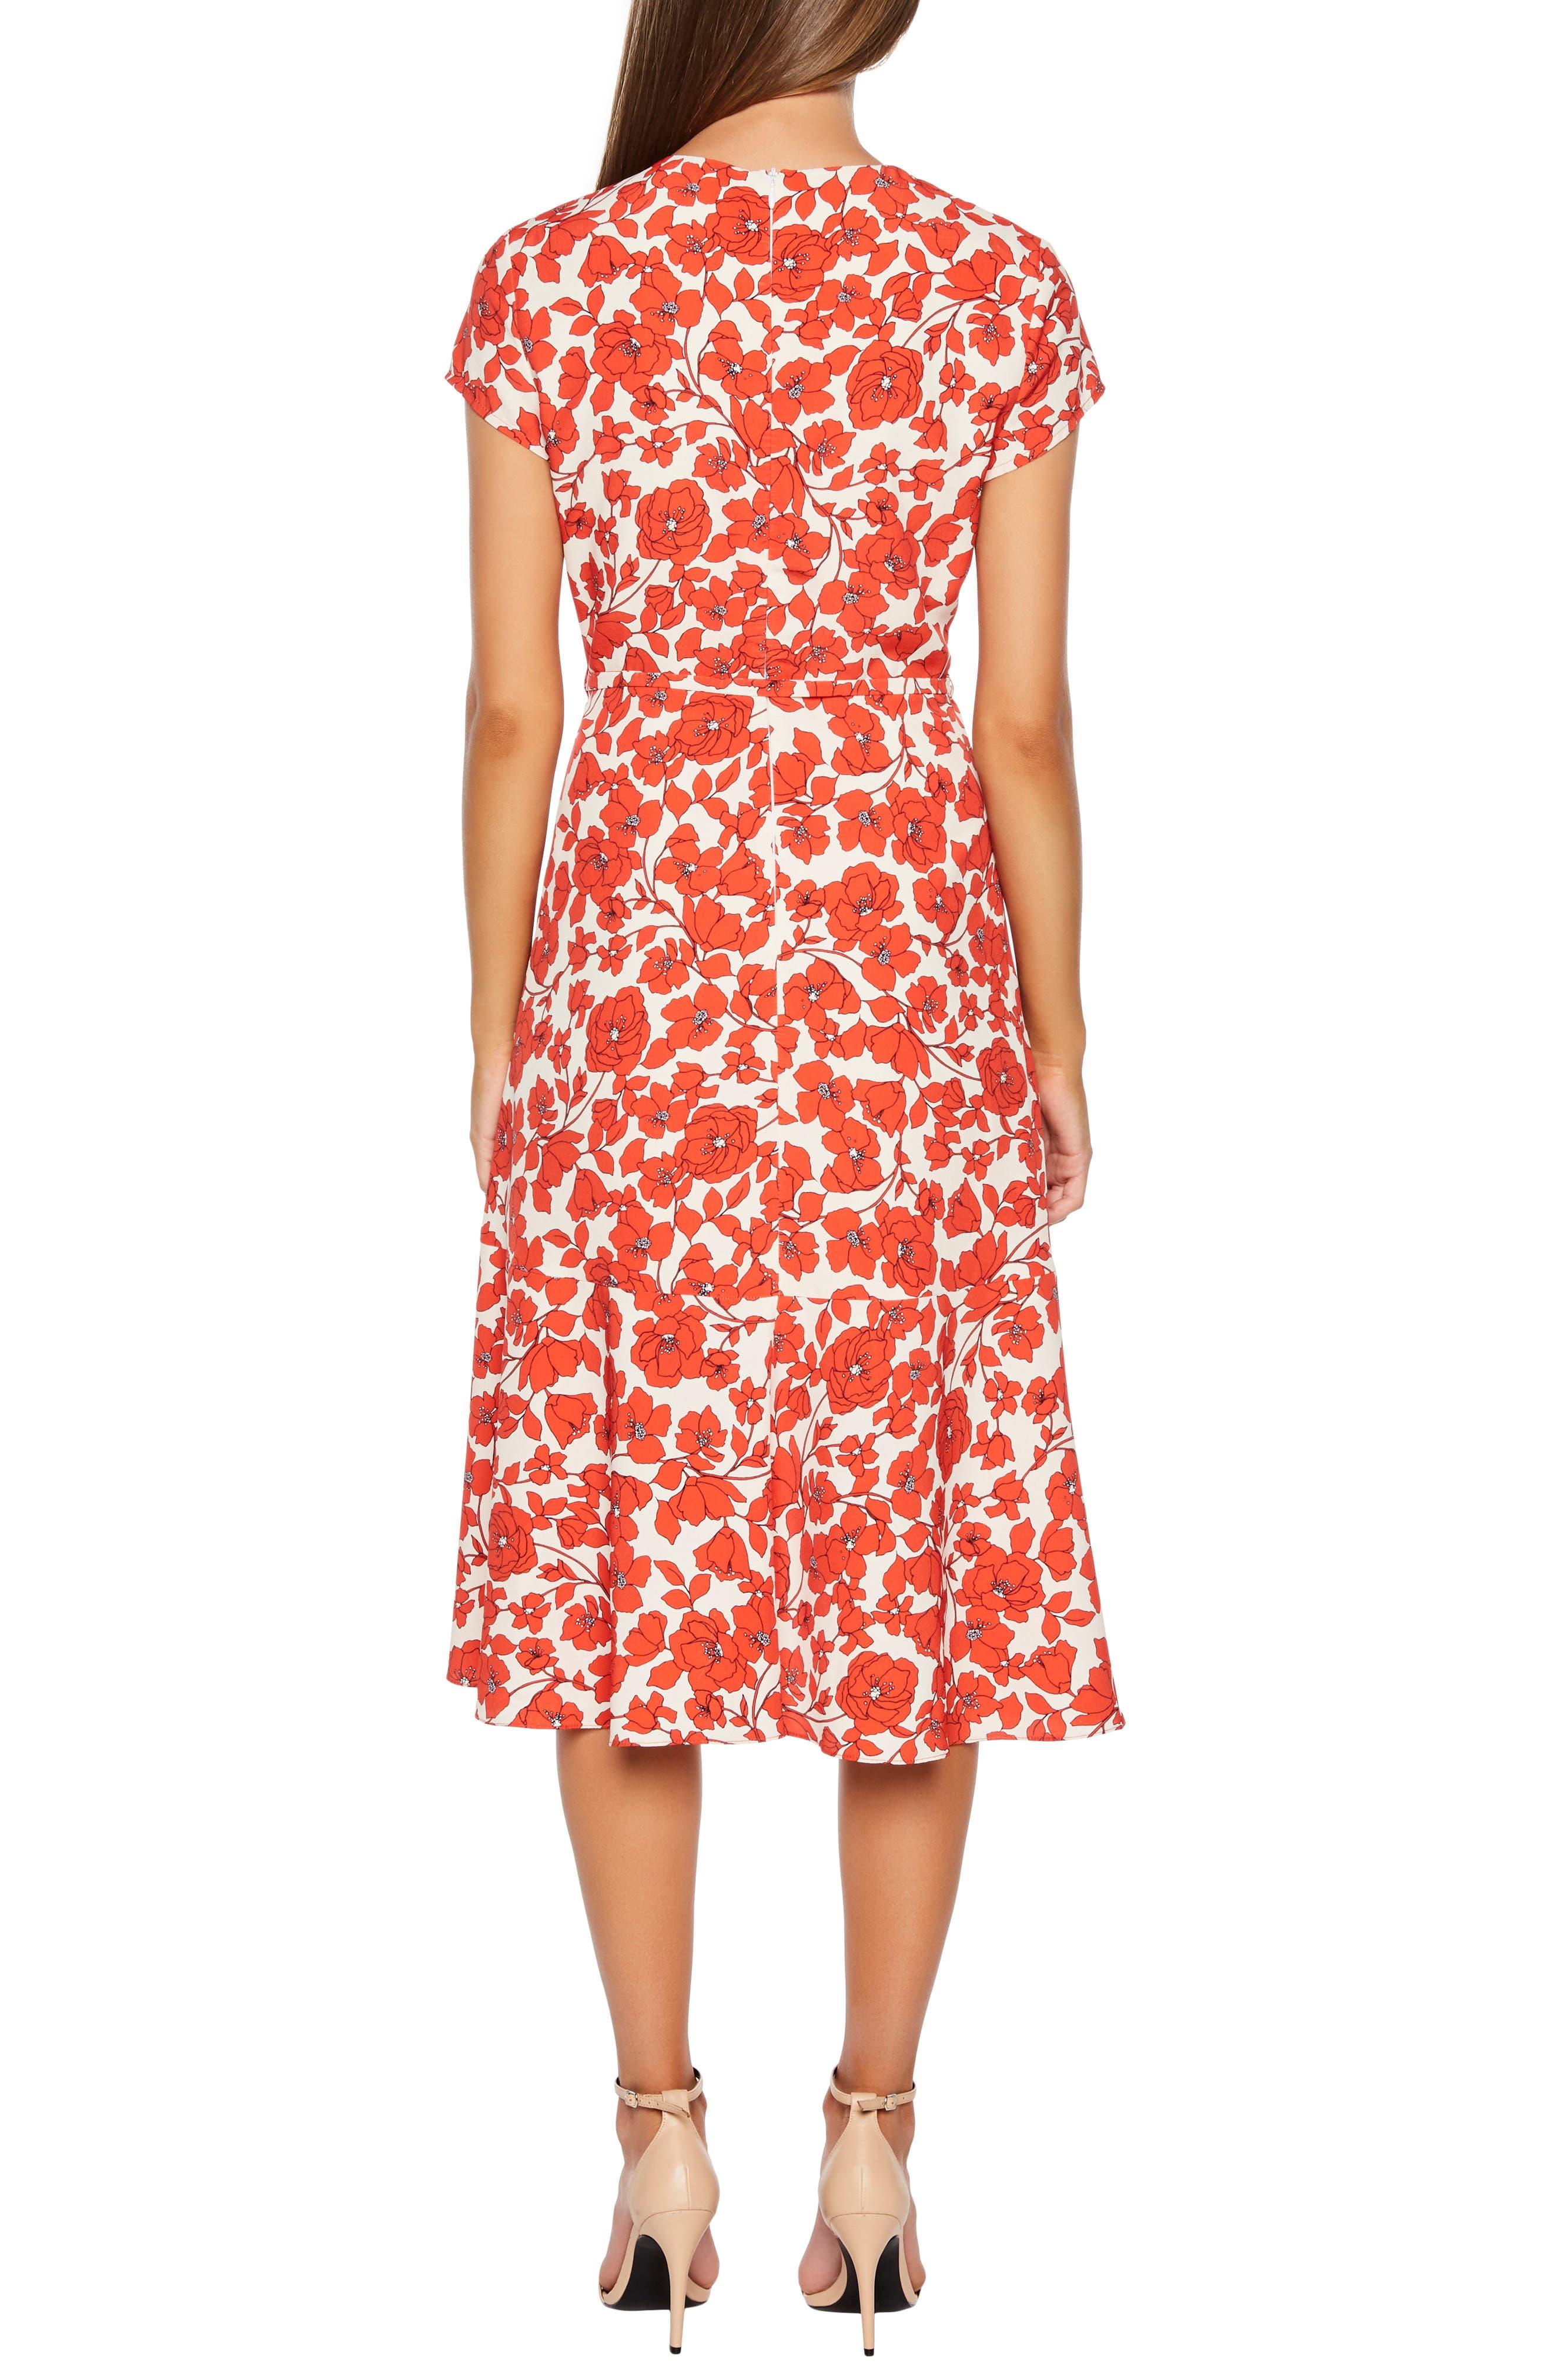 BARDOT, Fiesta Floral Midi Dress, Alternate thumbnail 2, color, 800